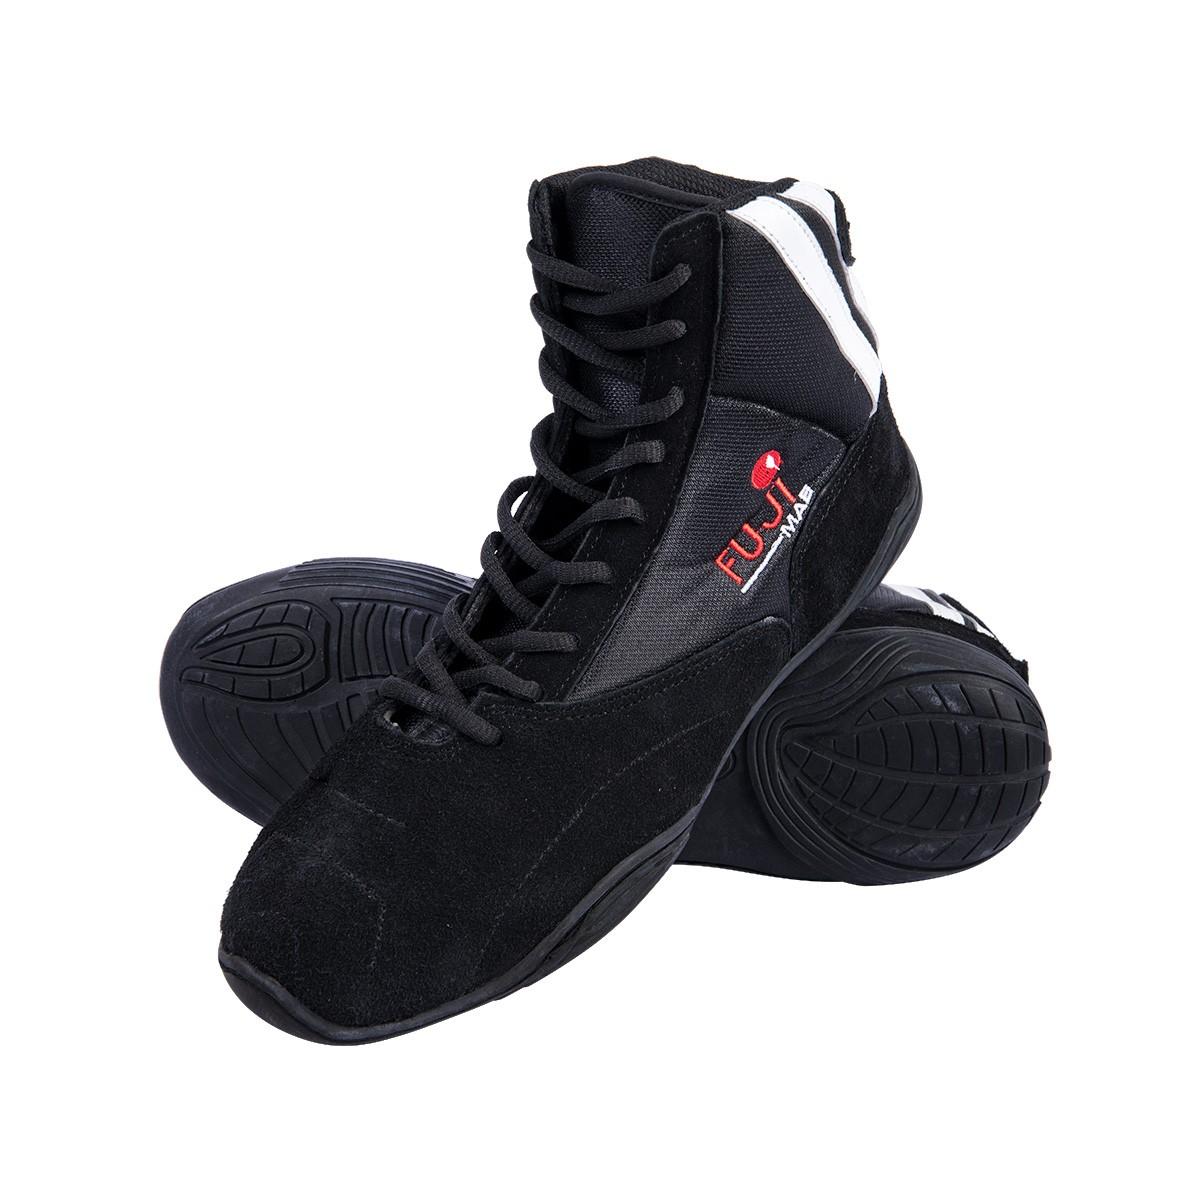 82d7002eea87 French Boxing Boots. Nylon Velvety